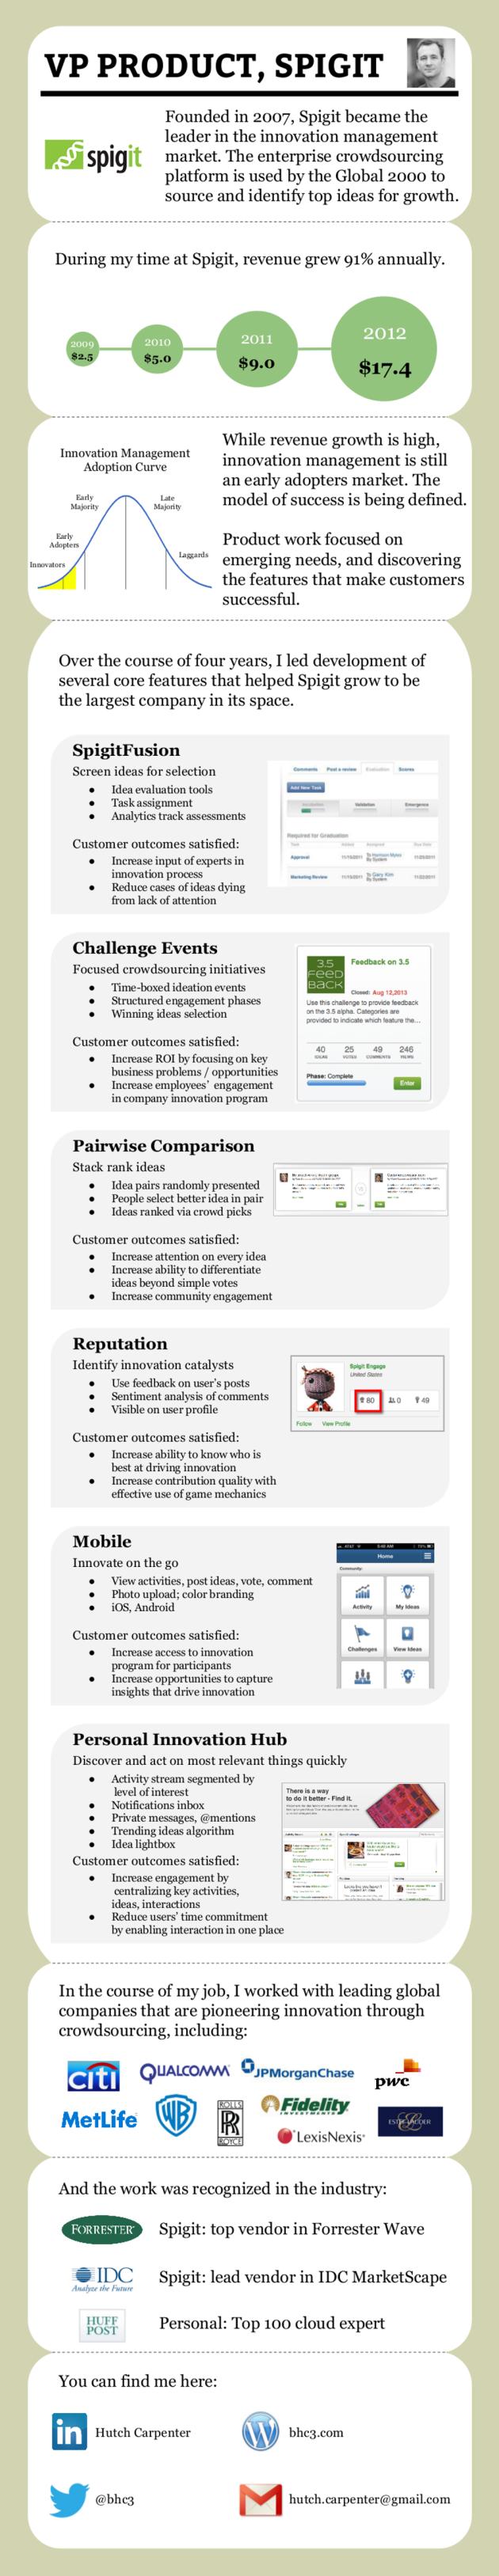 VP Product Spigit infographic